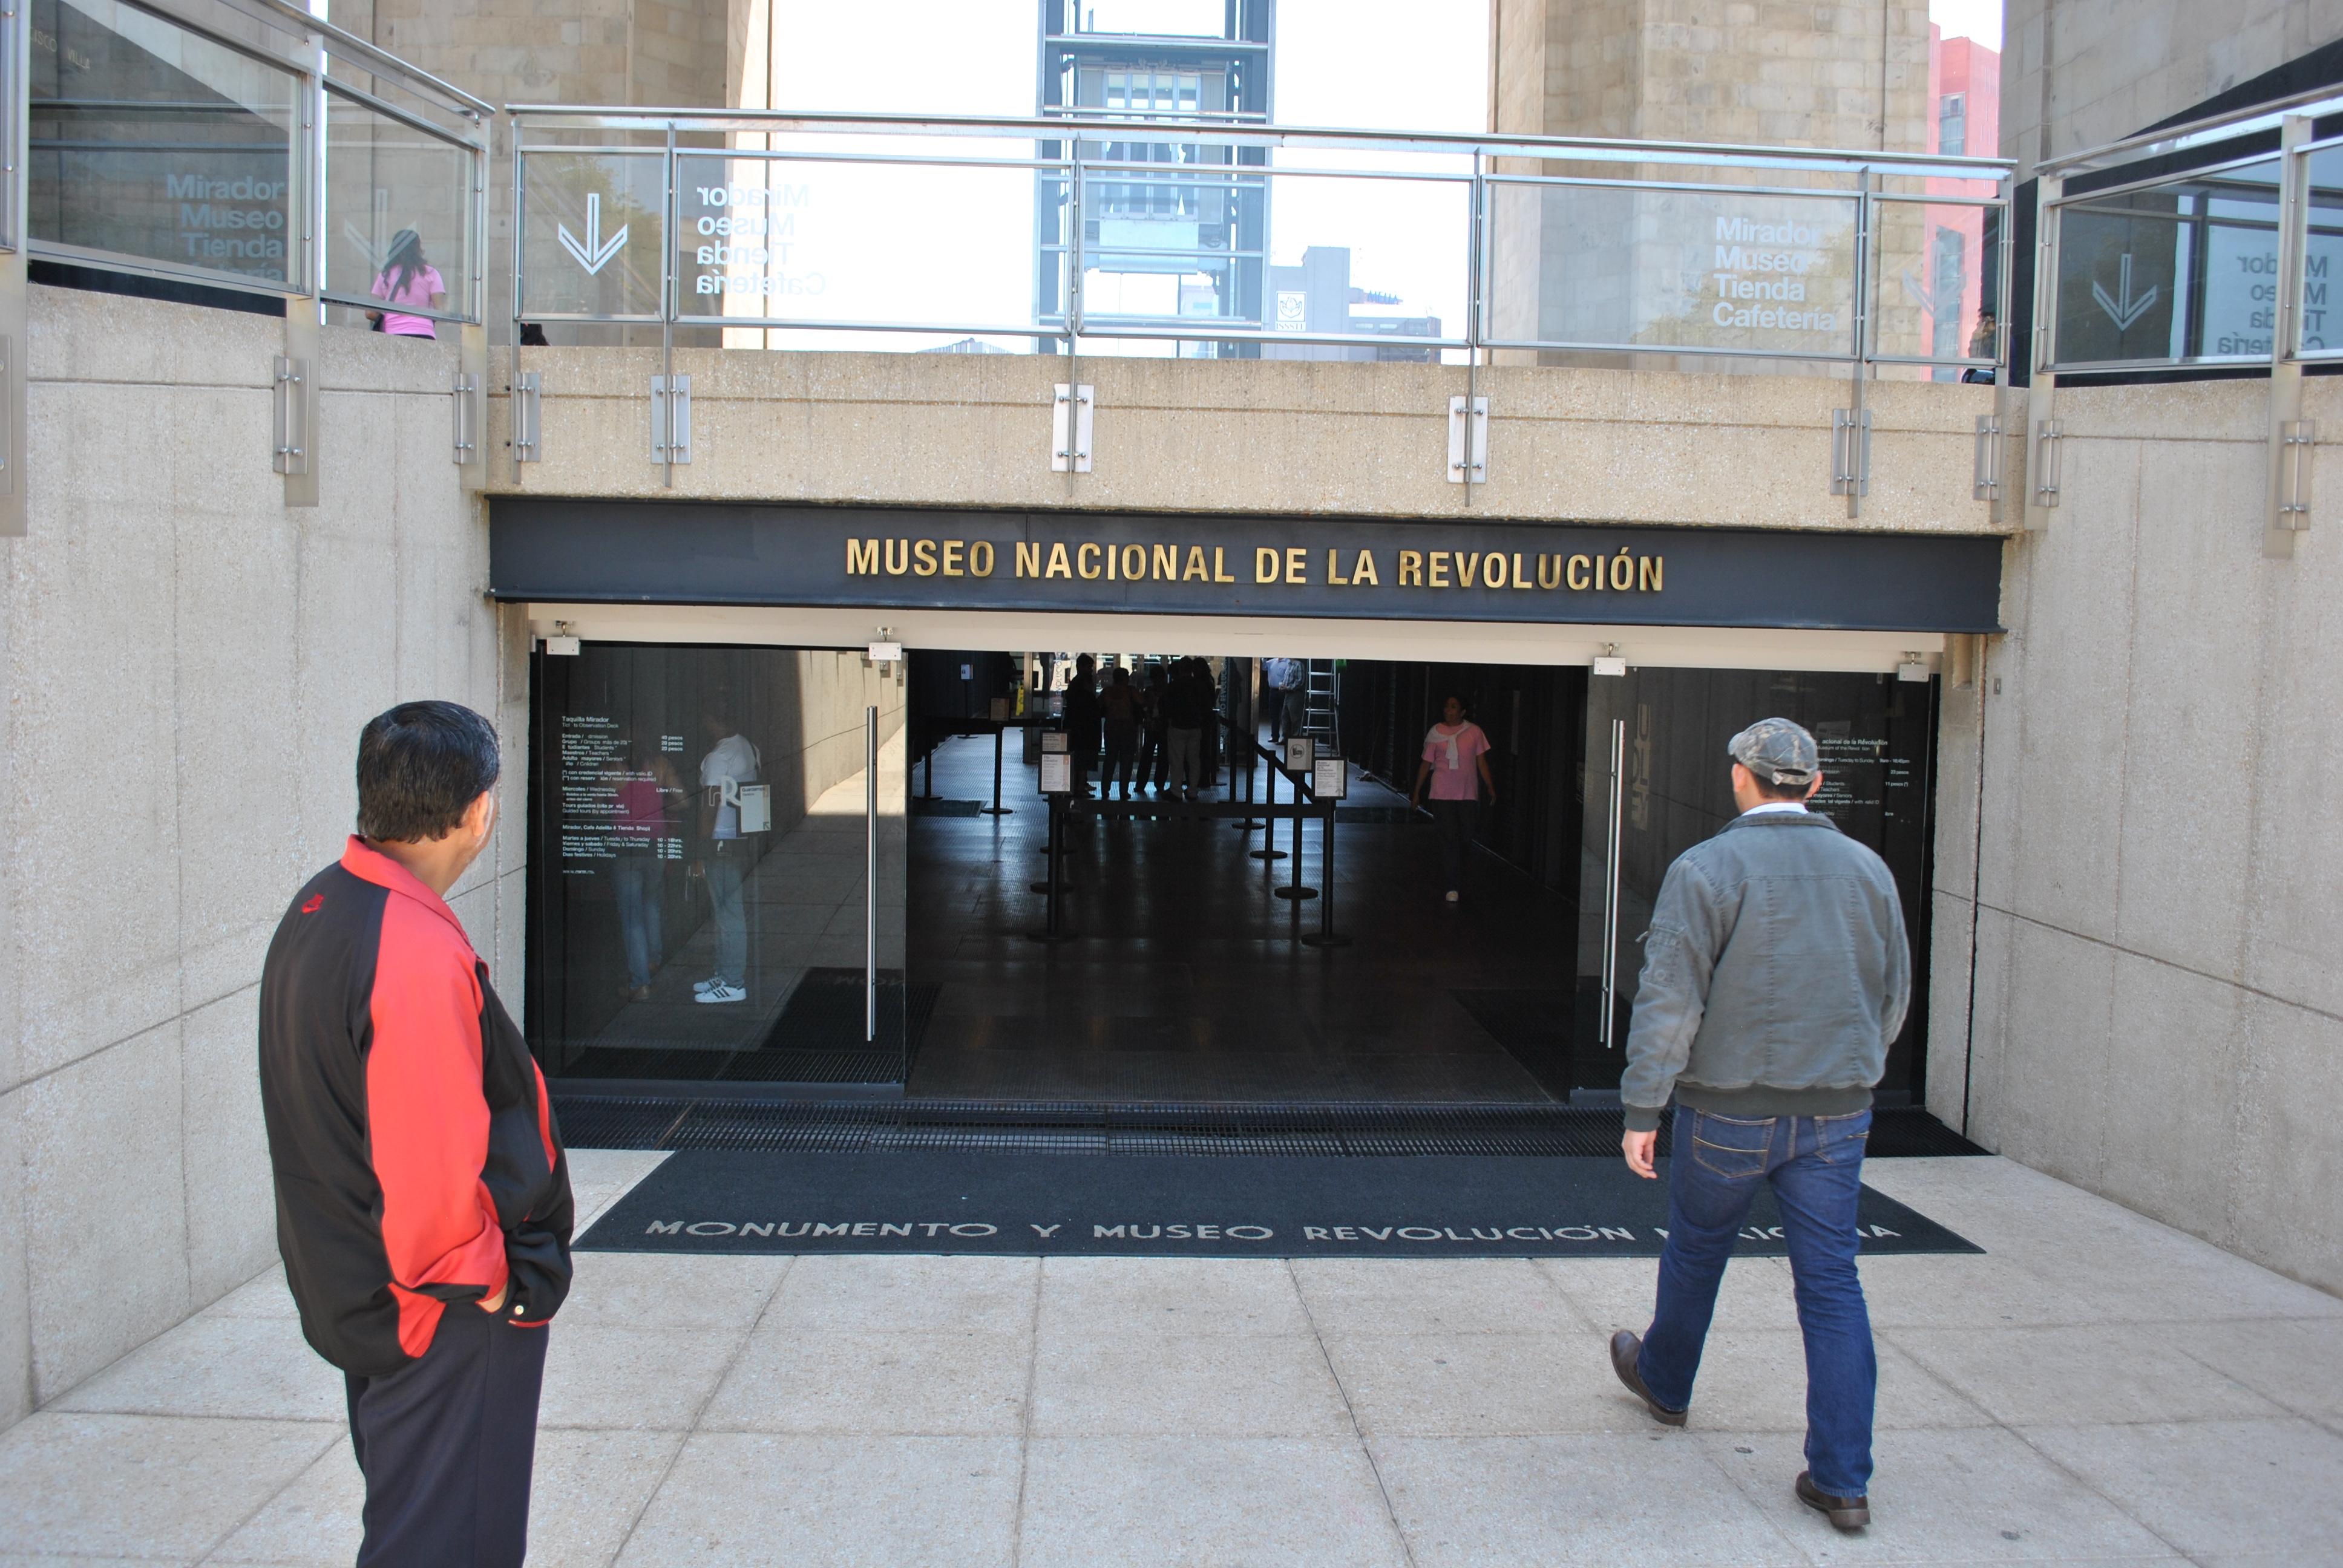 Museo De La Revolucion.Museo Nacional De La Revolucion Wikipedia La Enciclopedia Libre